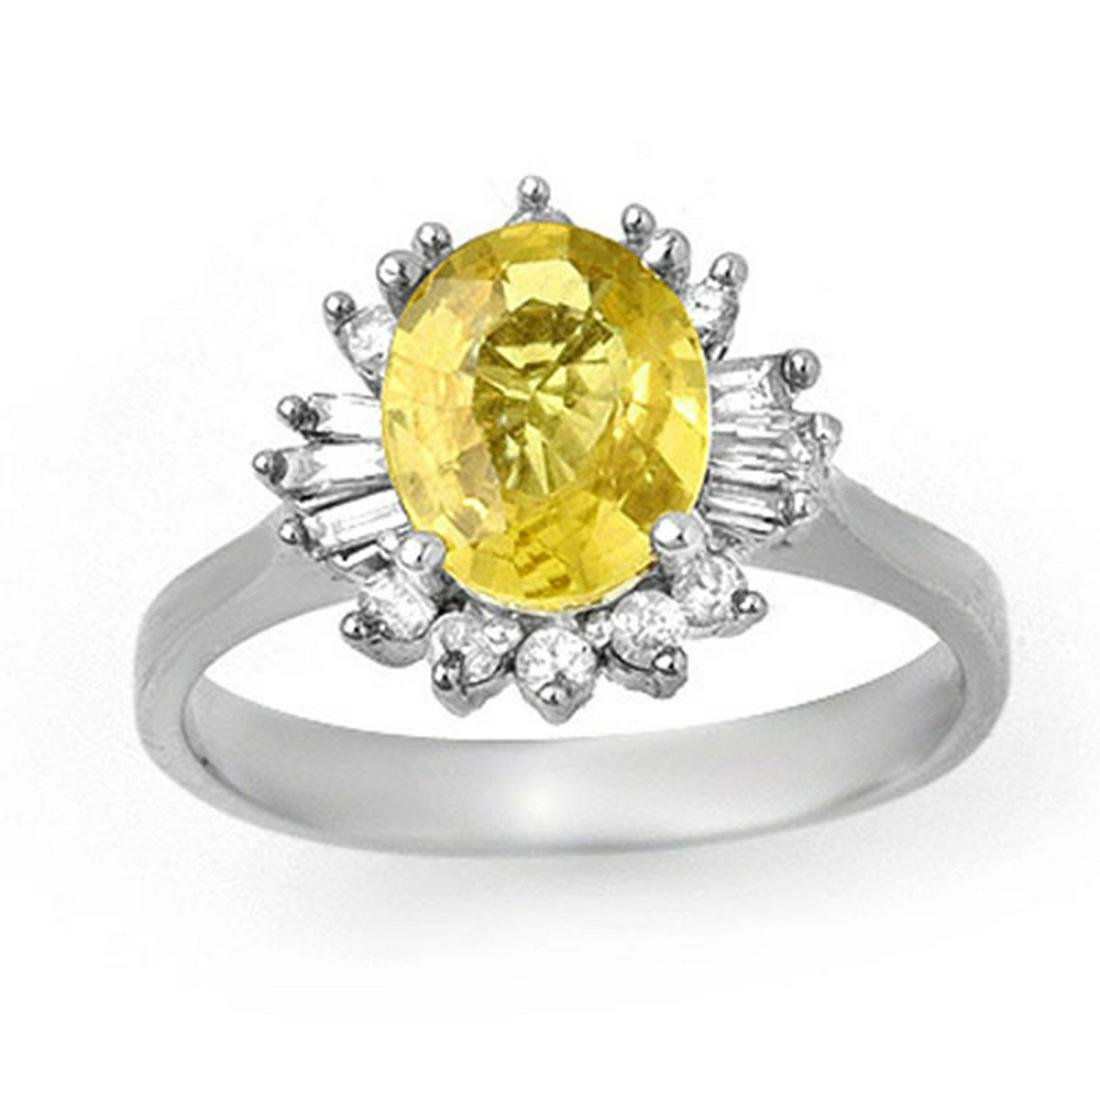 2.25 ctw Blue Sapphire & Diamond Ring 14K White Gold